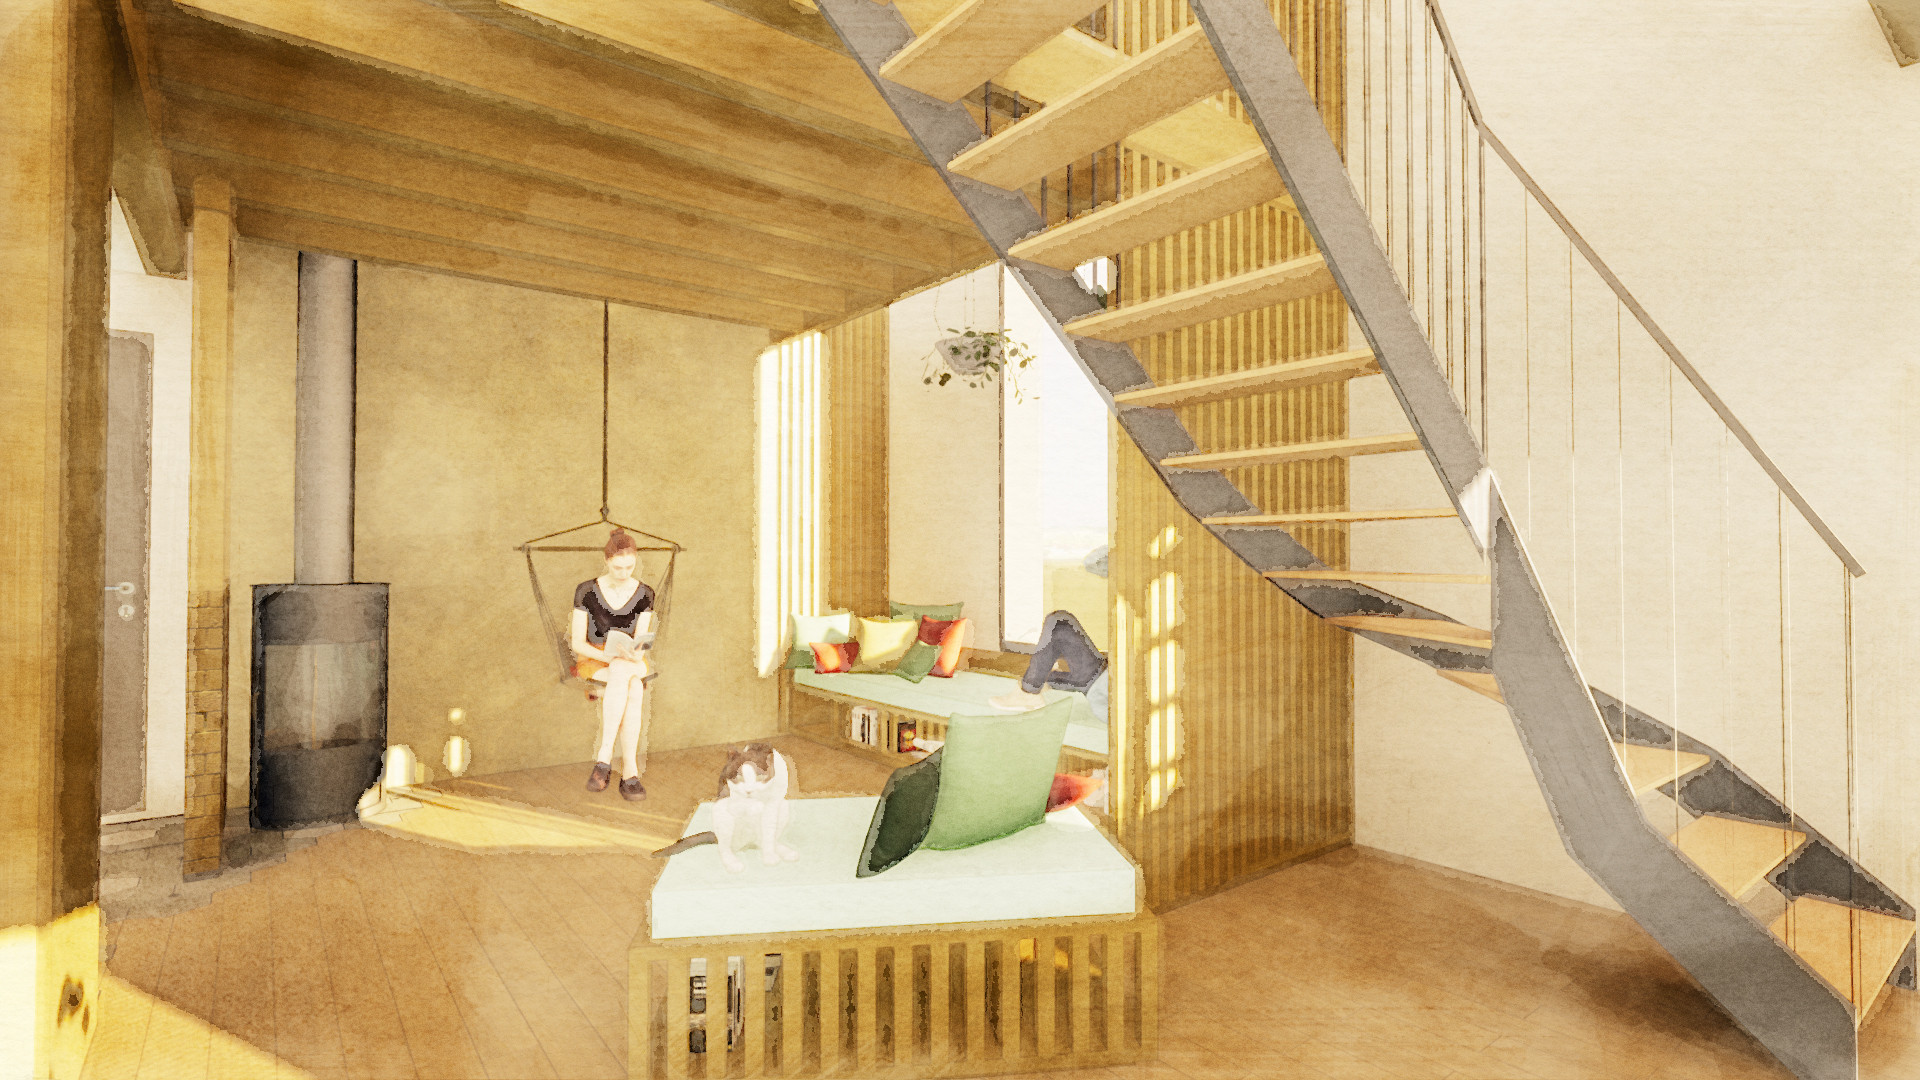 Hirundo-Architecture_Projet B&R_01.jpg